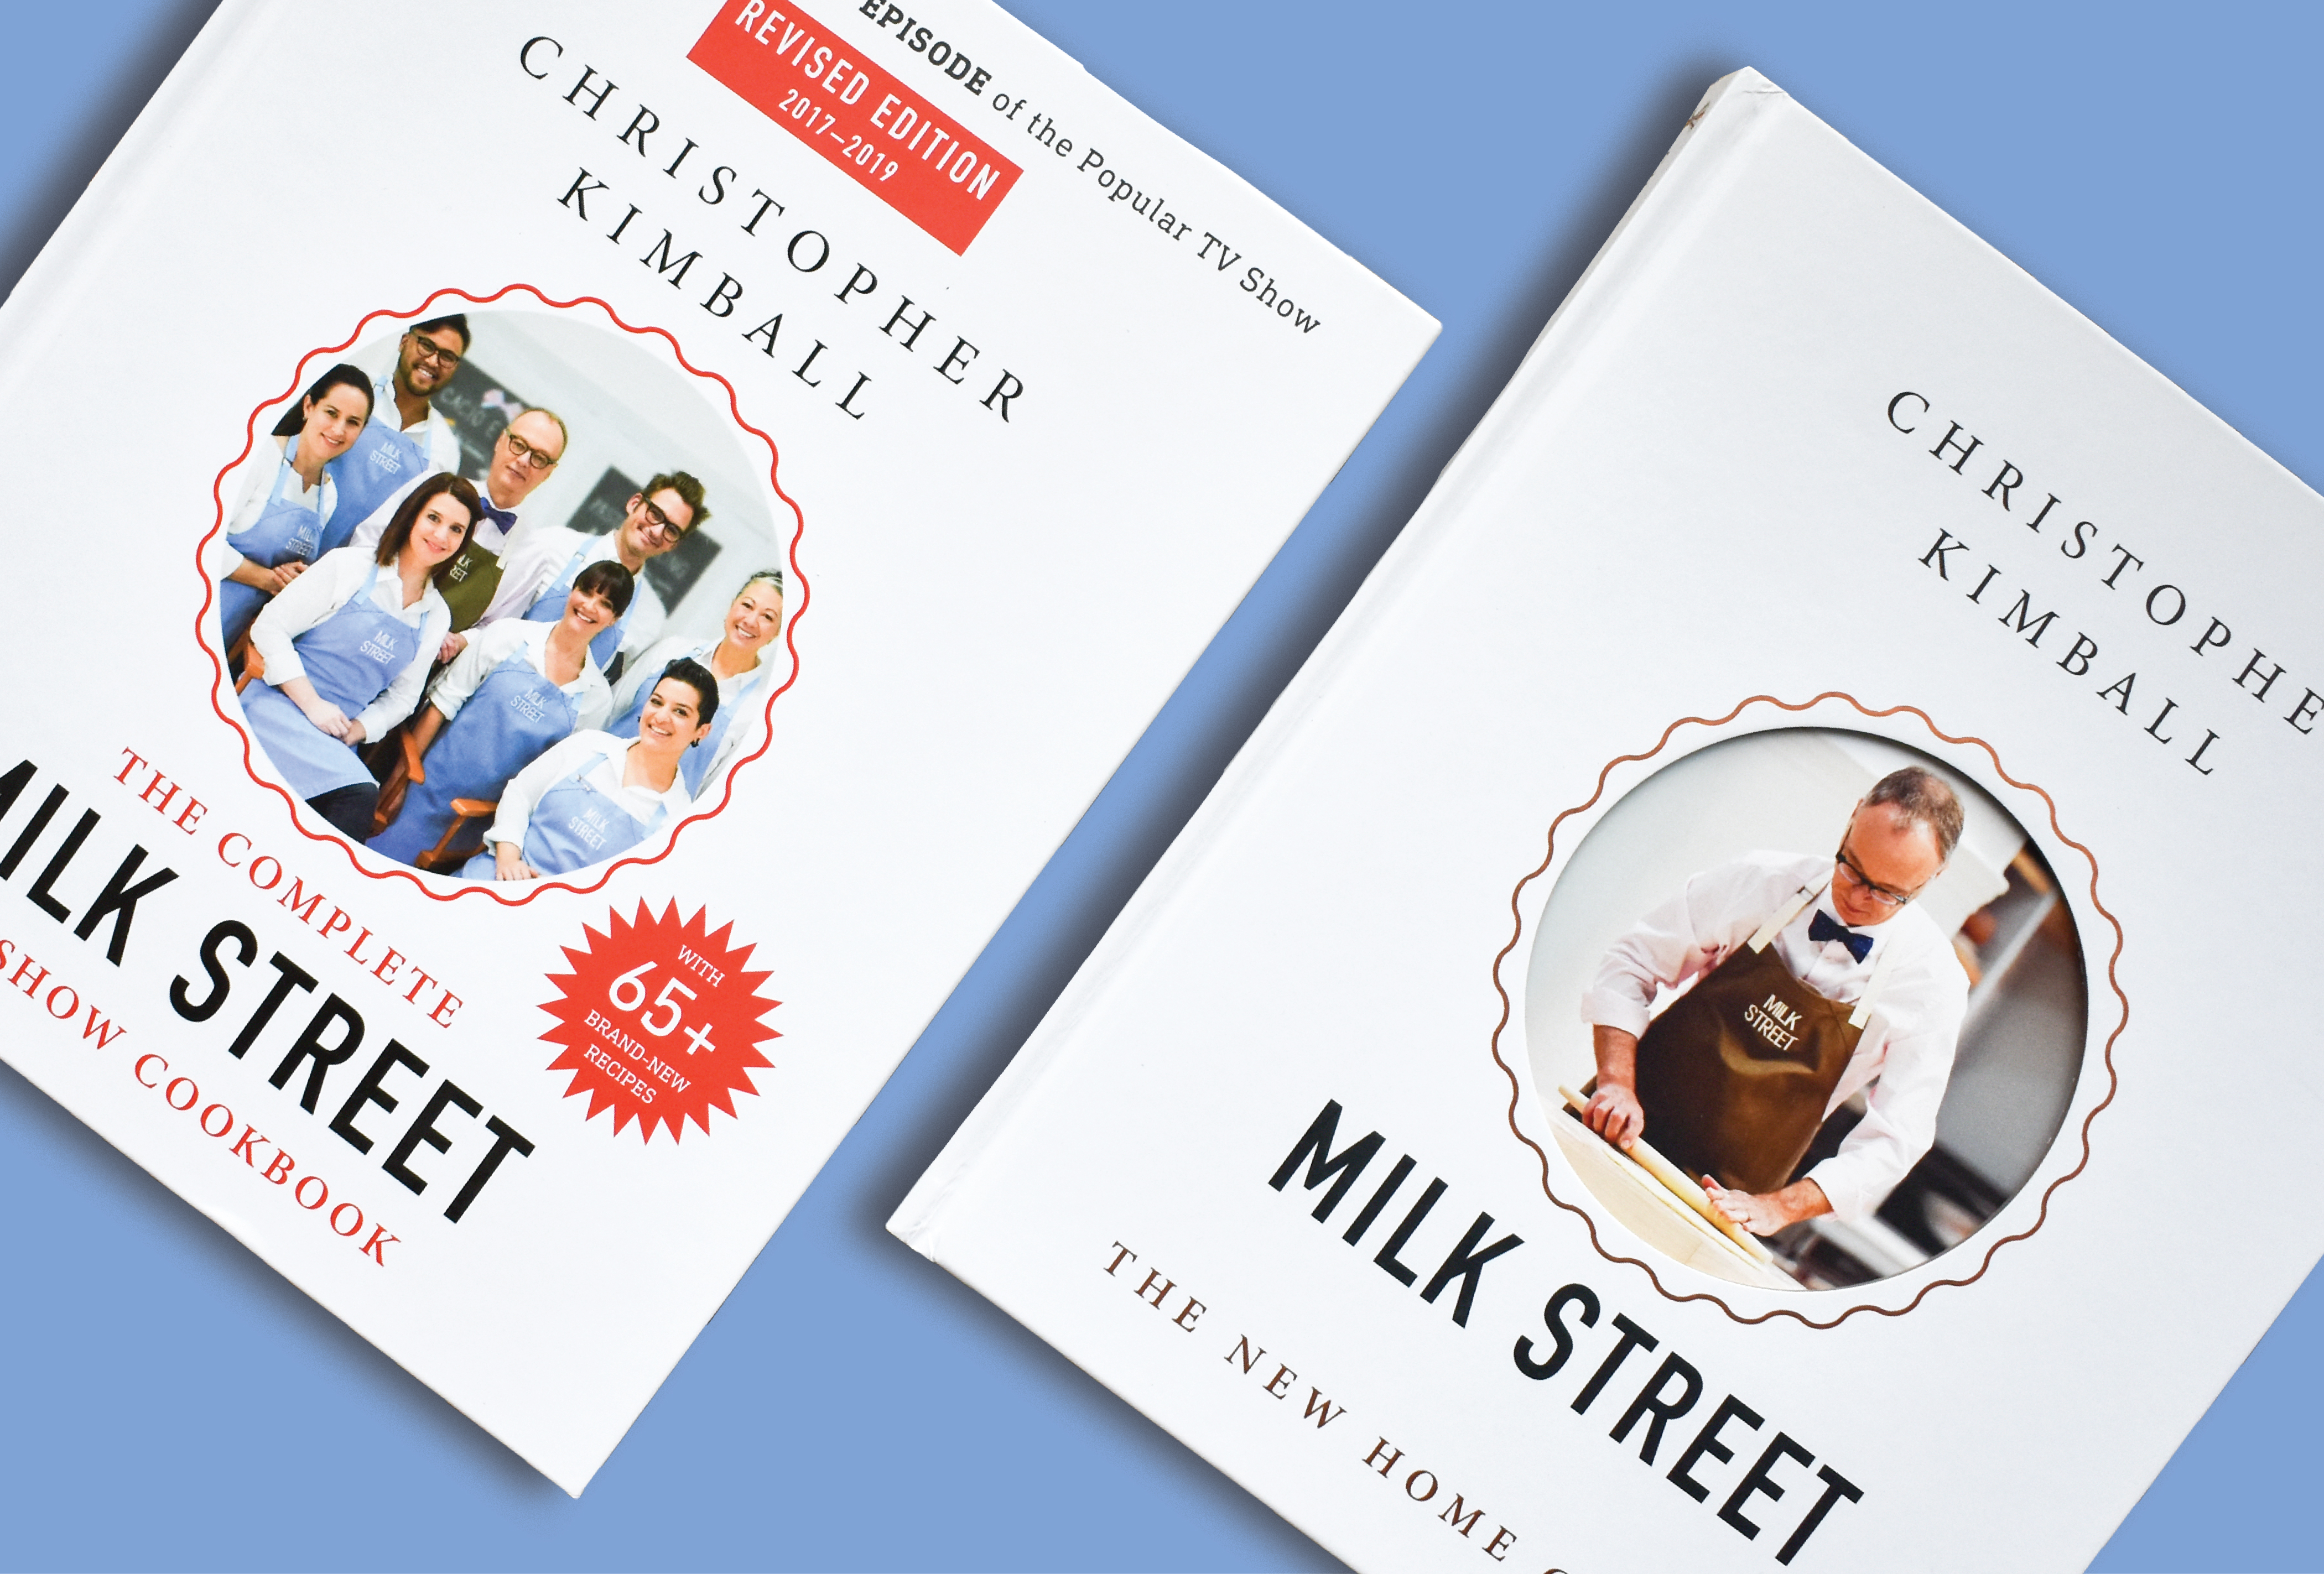 Christopher Kimball's Milk Street TV Books